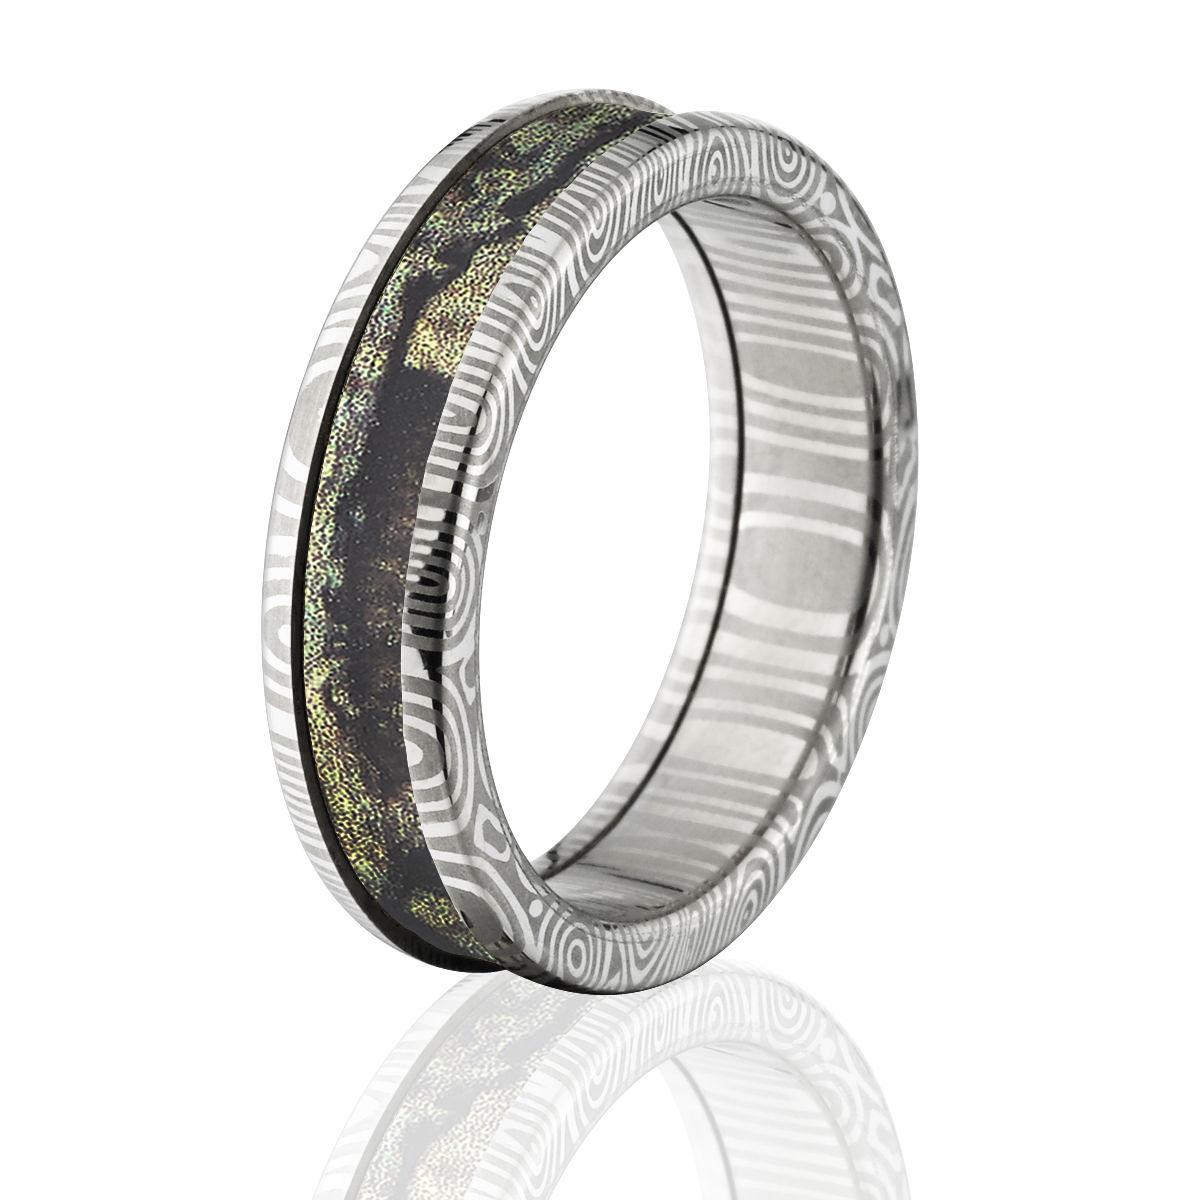 Damascus Steel Camo Rings 6mm Break Up Infinity Camo Band